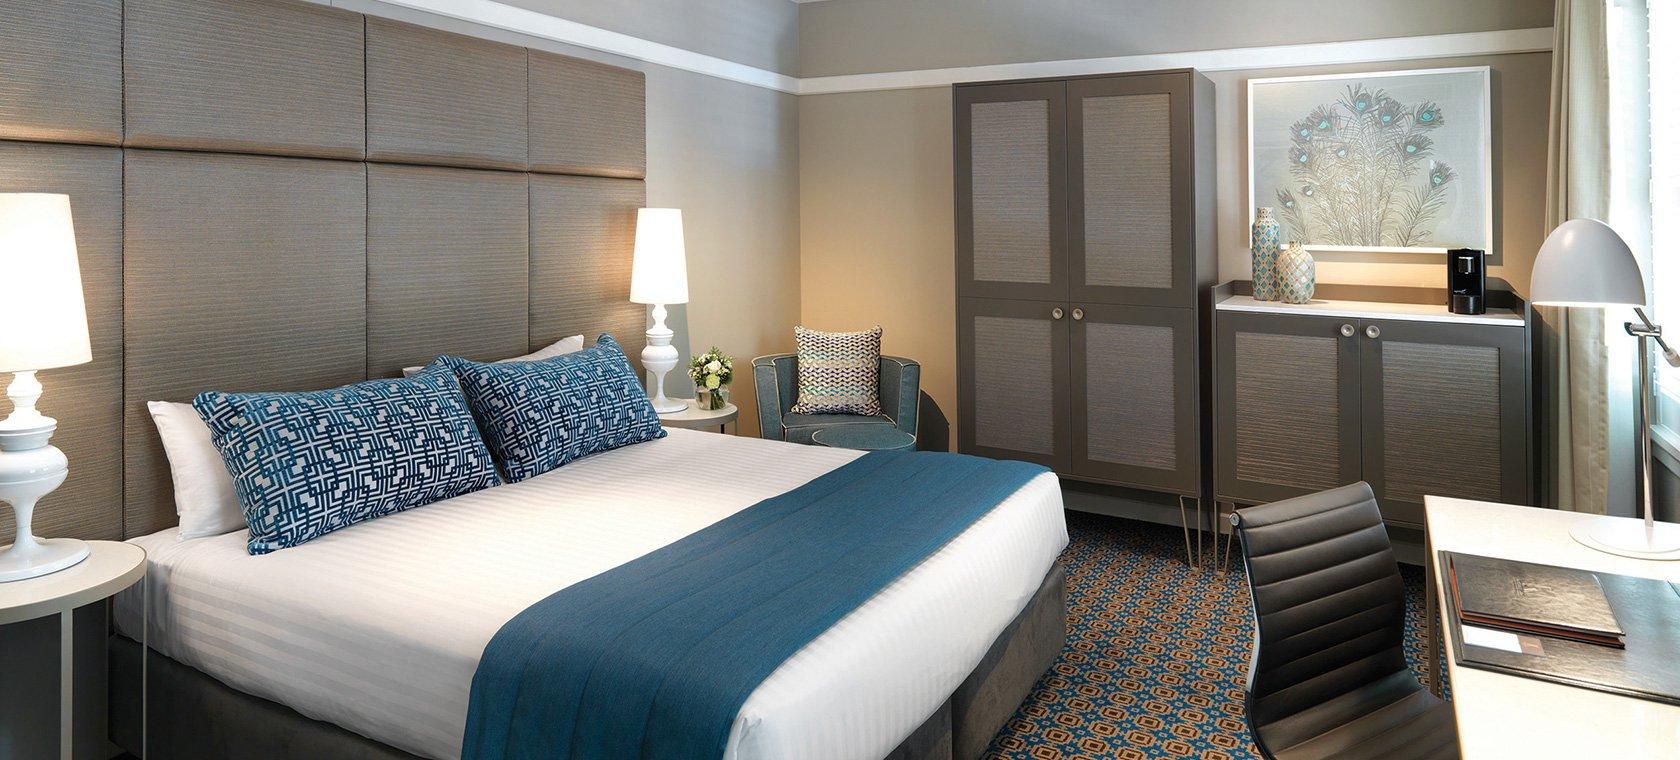 hotel-kurrajong-canberra-classic-room-king-02-2015.66-1.jpg